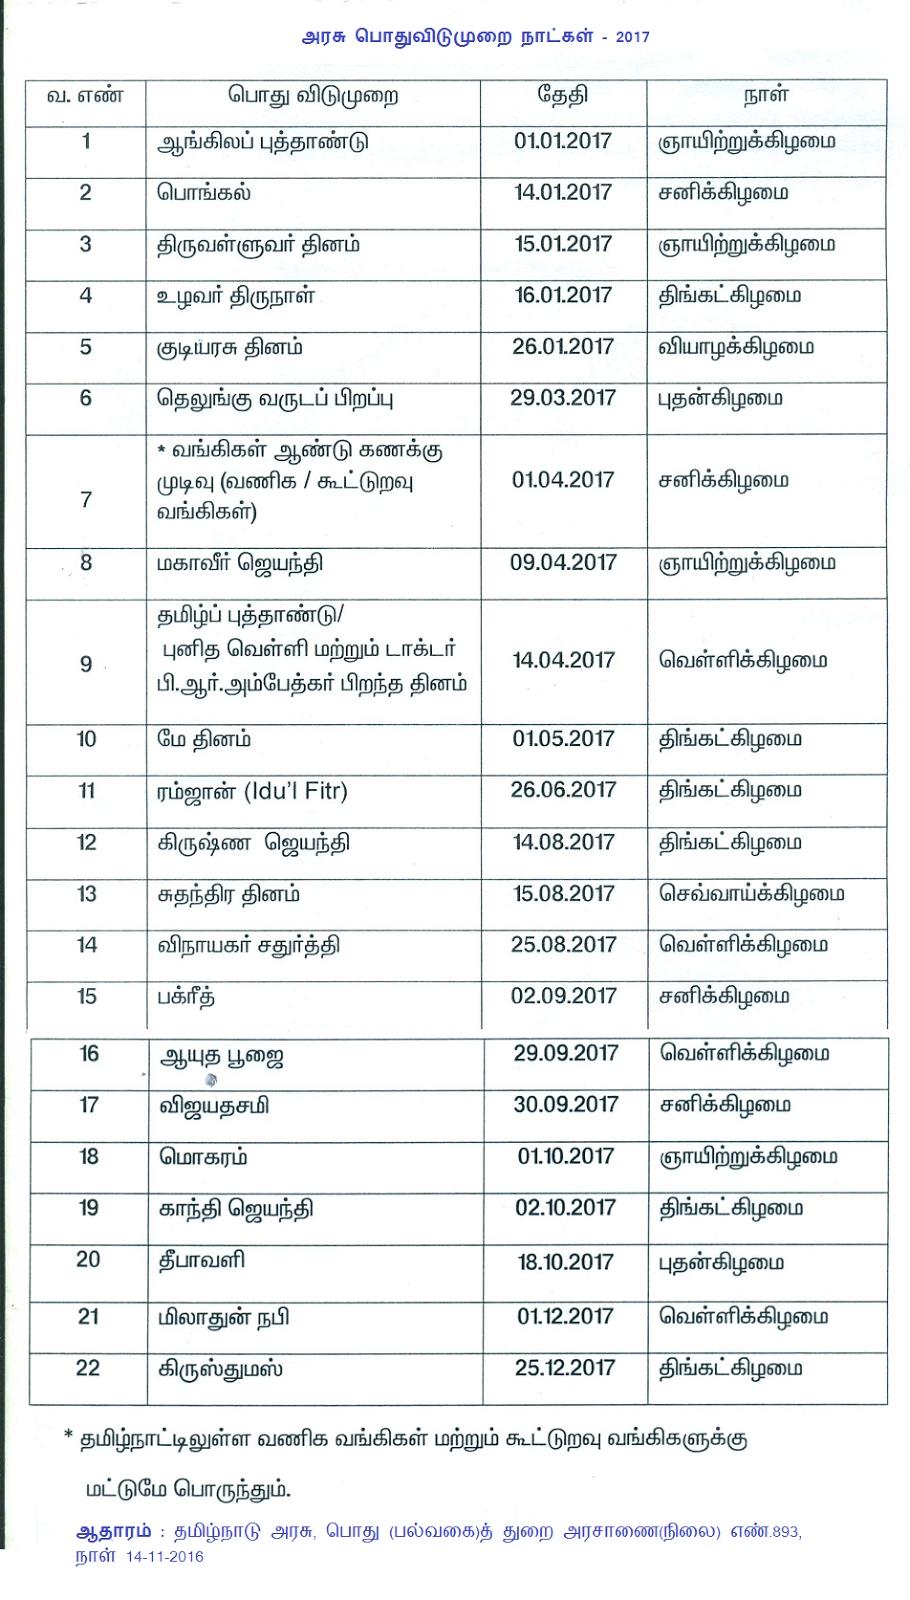 Tamilnadu Government Holidays List - 2017-Tamilnadu Holidays By Month